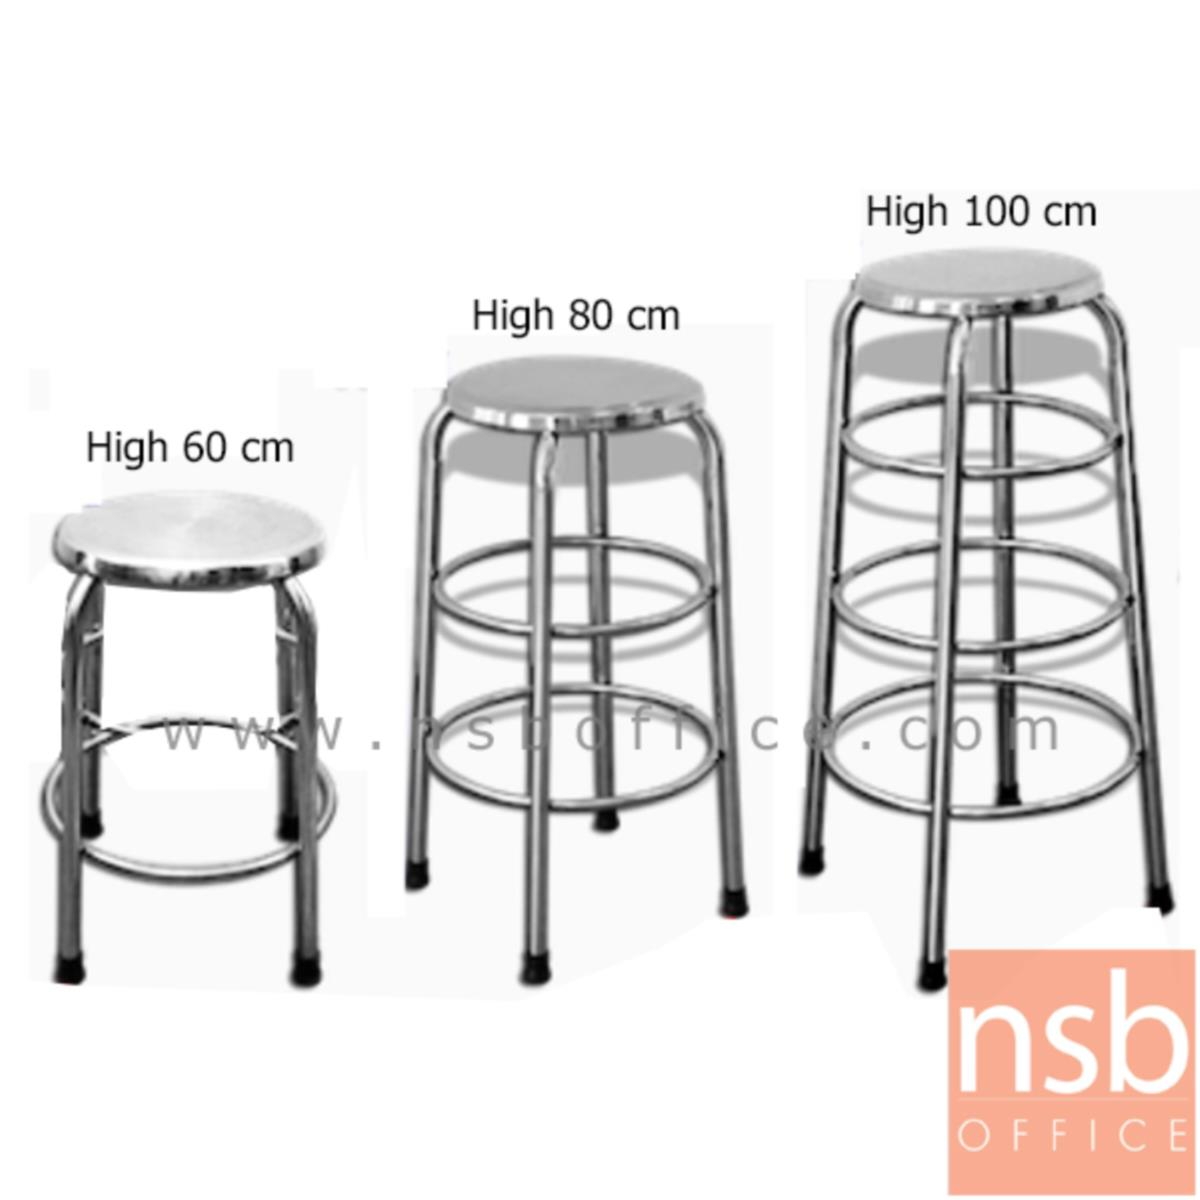 G12A183:เก้าอี้สเตนเลสกลม รุ่น Monty (ม็อนตี้) 36Di cm. (ผลิต 3 ความสูง 60H, 80H, 100 H cm.) เกรด 304